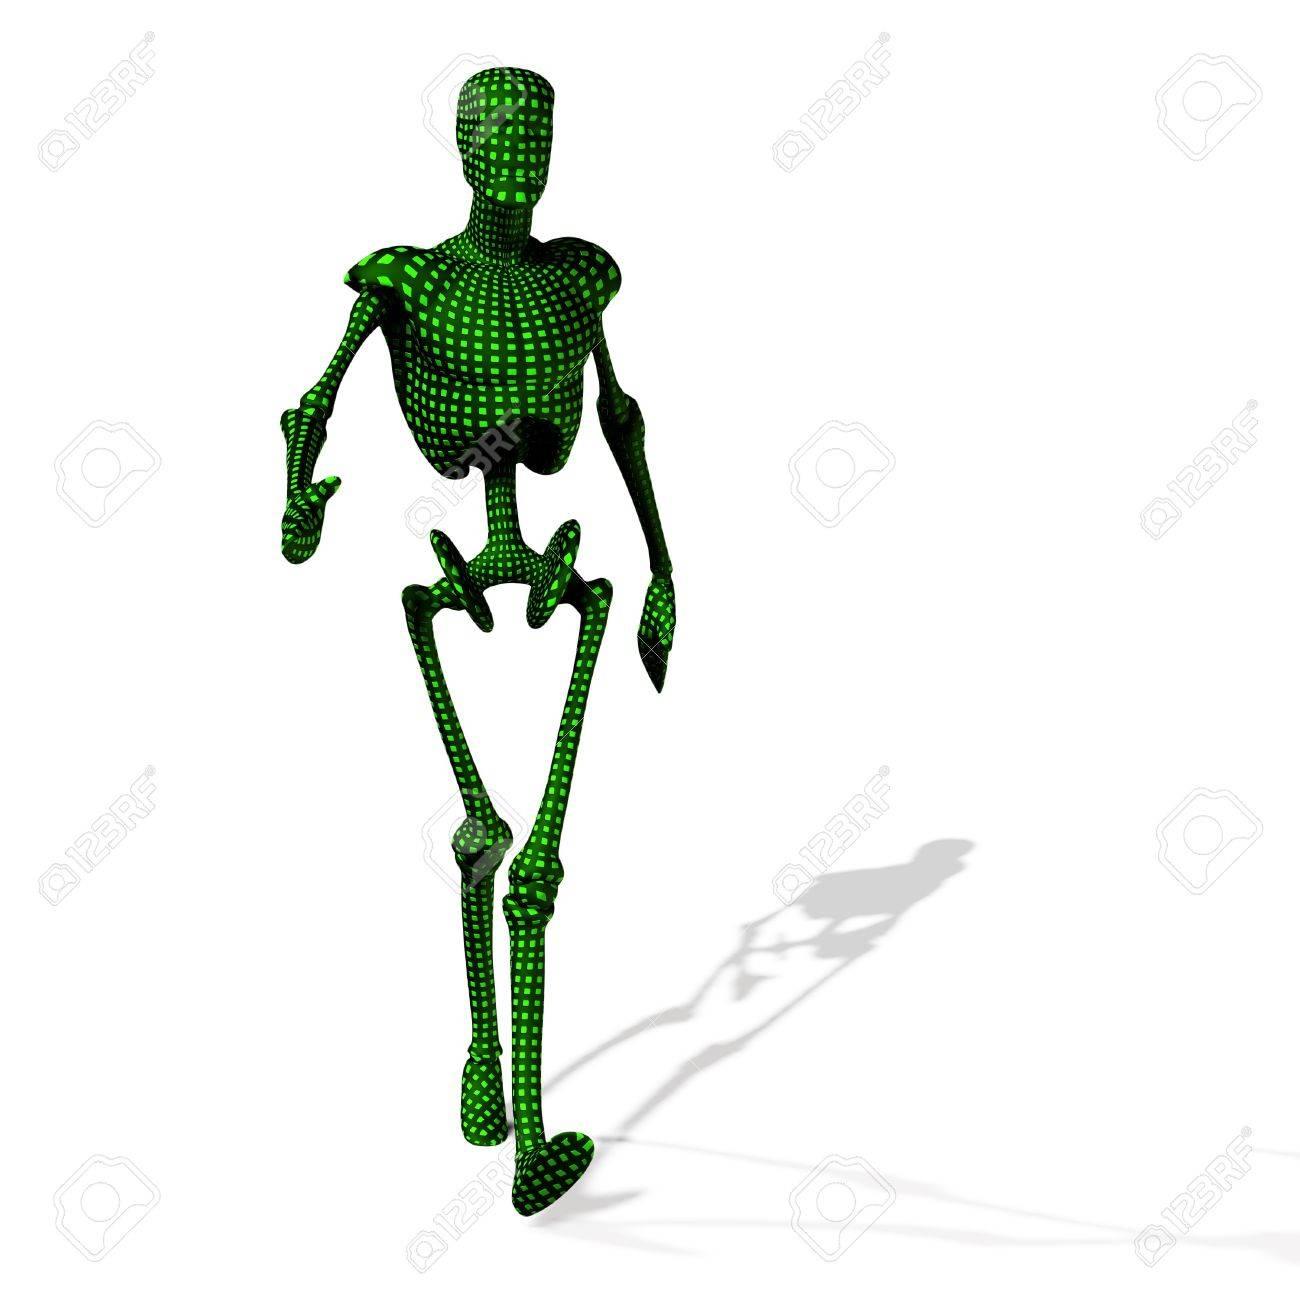 Abstract green cyborg, robot, futuristic cyber humanoid Stock Photo - 15147038